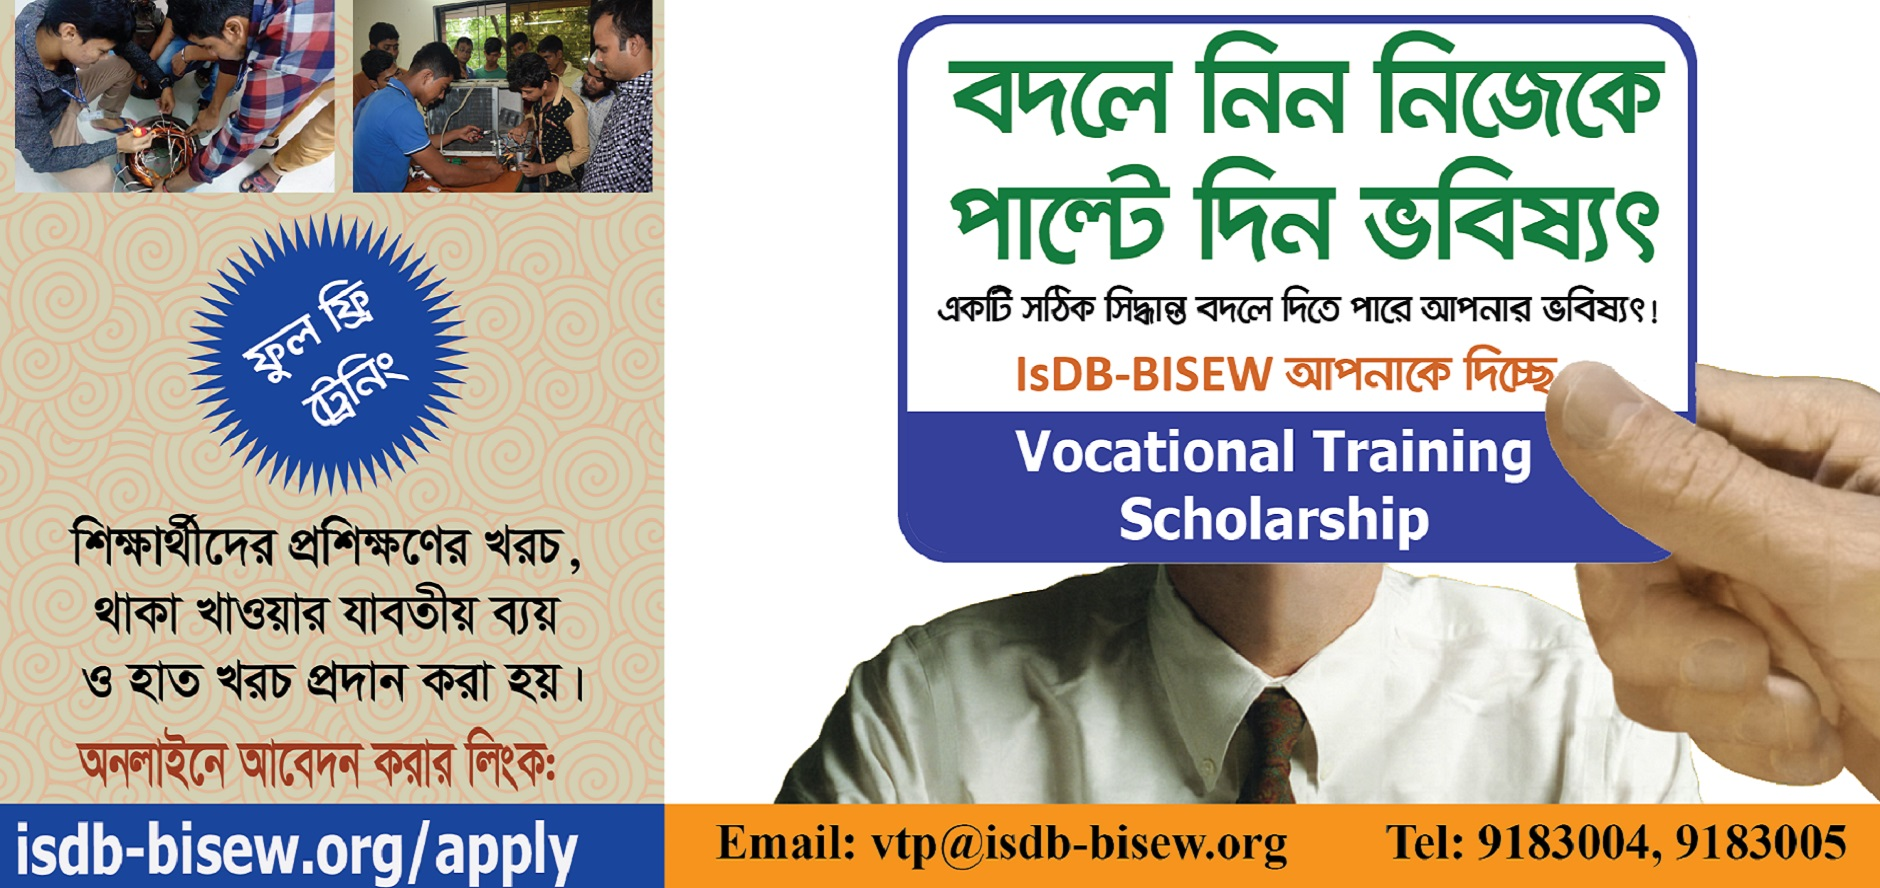 Intake Notice for Vocational Training Program